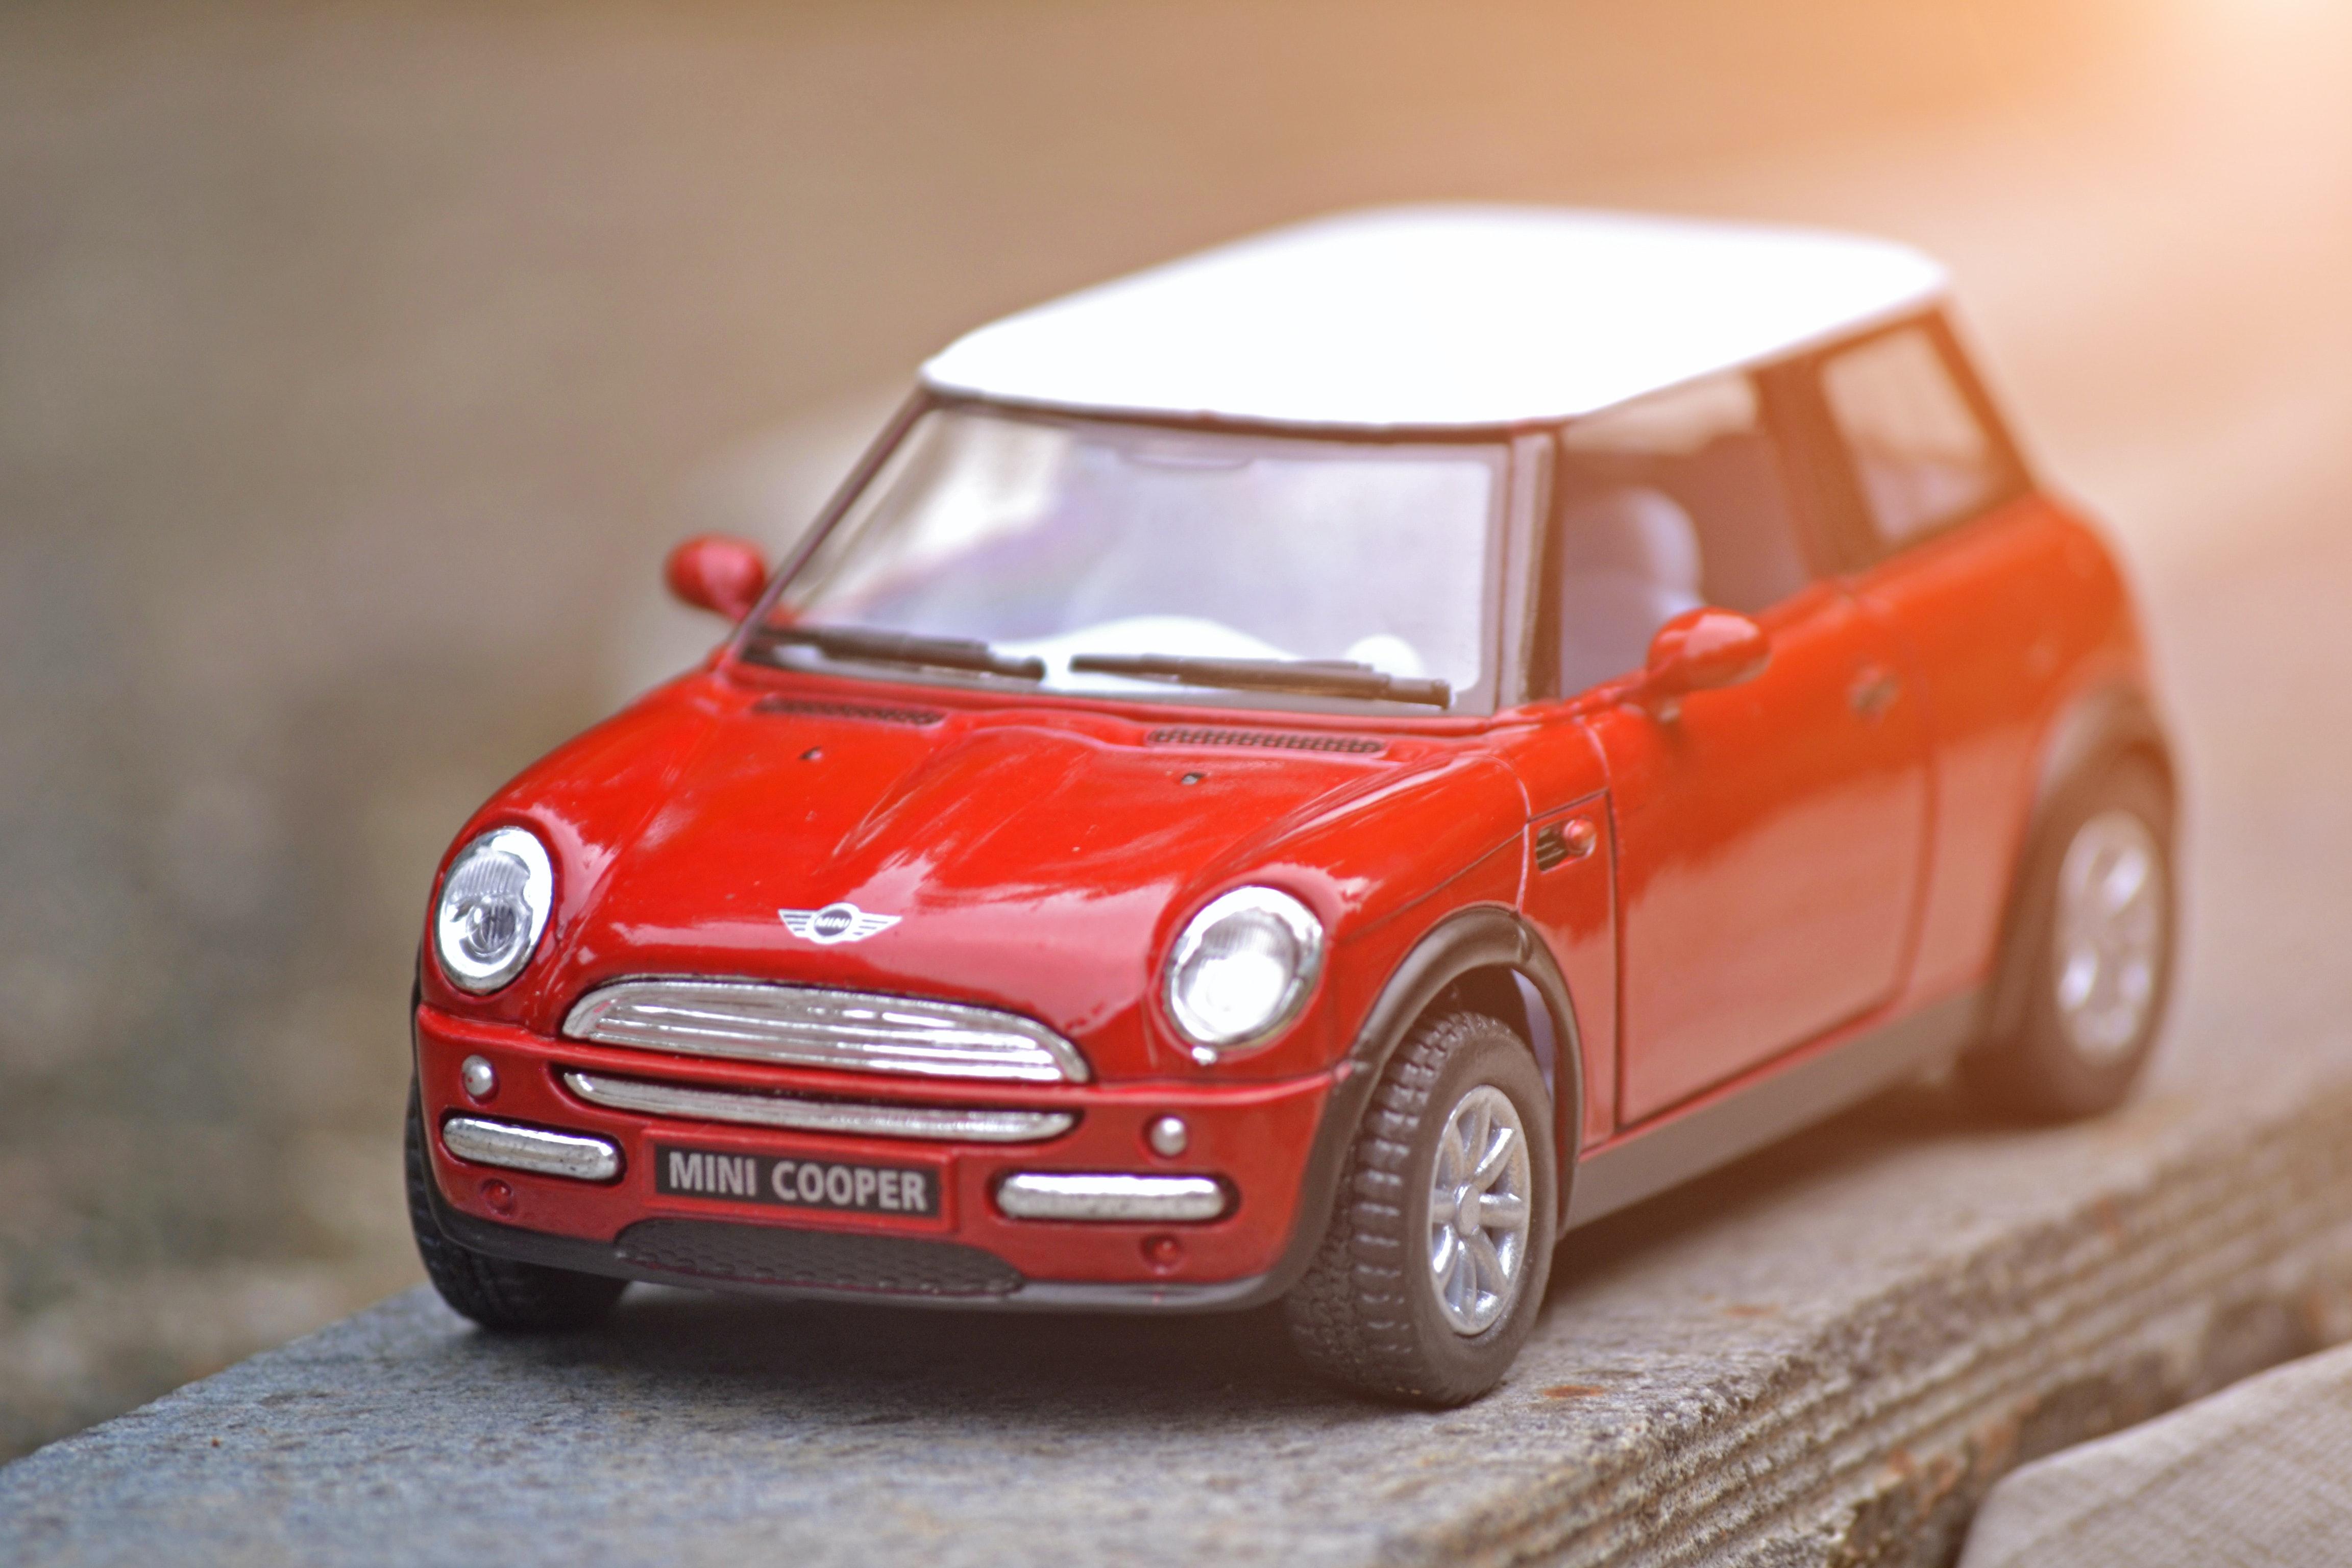 Free stock photo of automobile, car, Mini Cooper